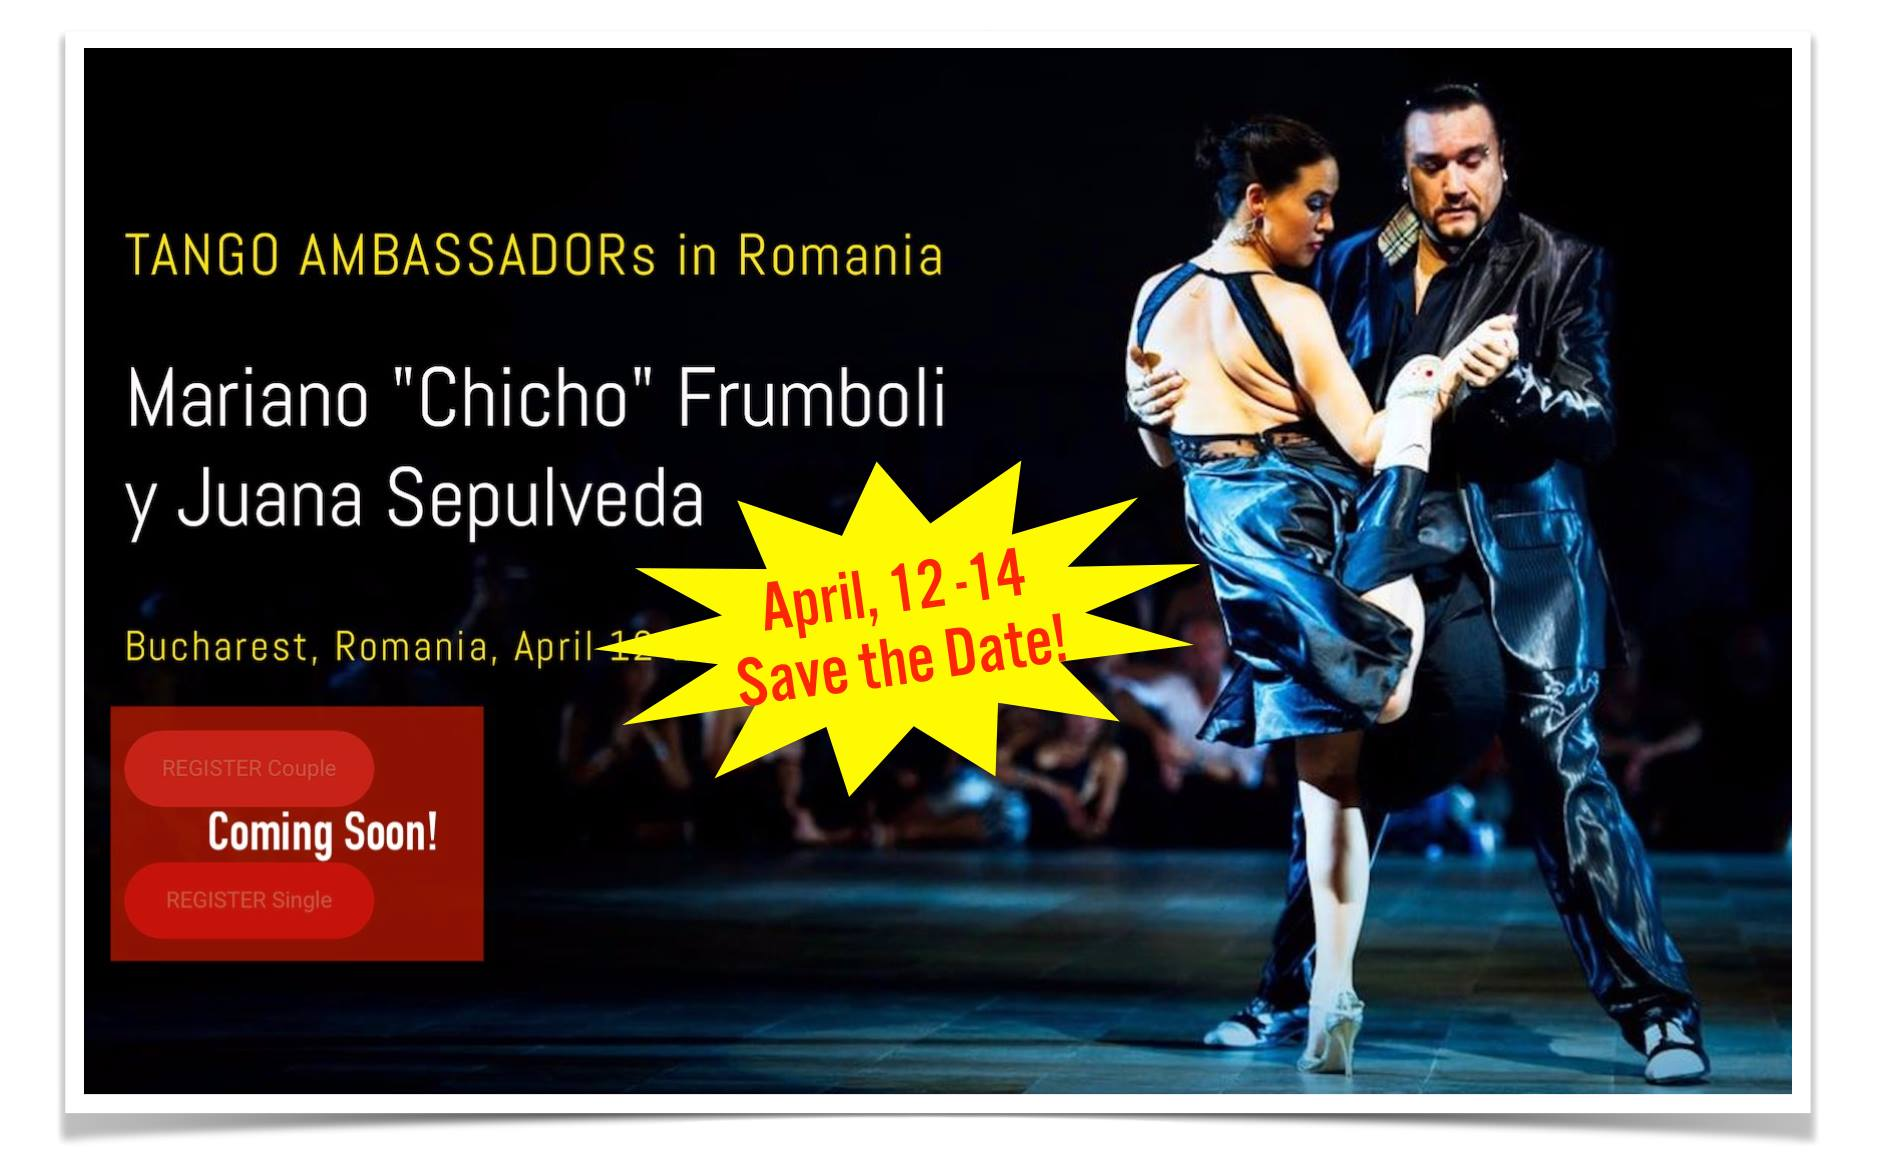 chicho-y-juana-in-romania-tango-ambassadors-tangent-